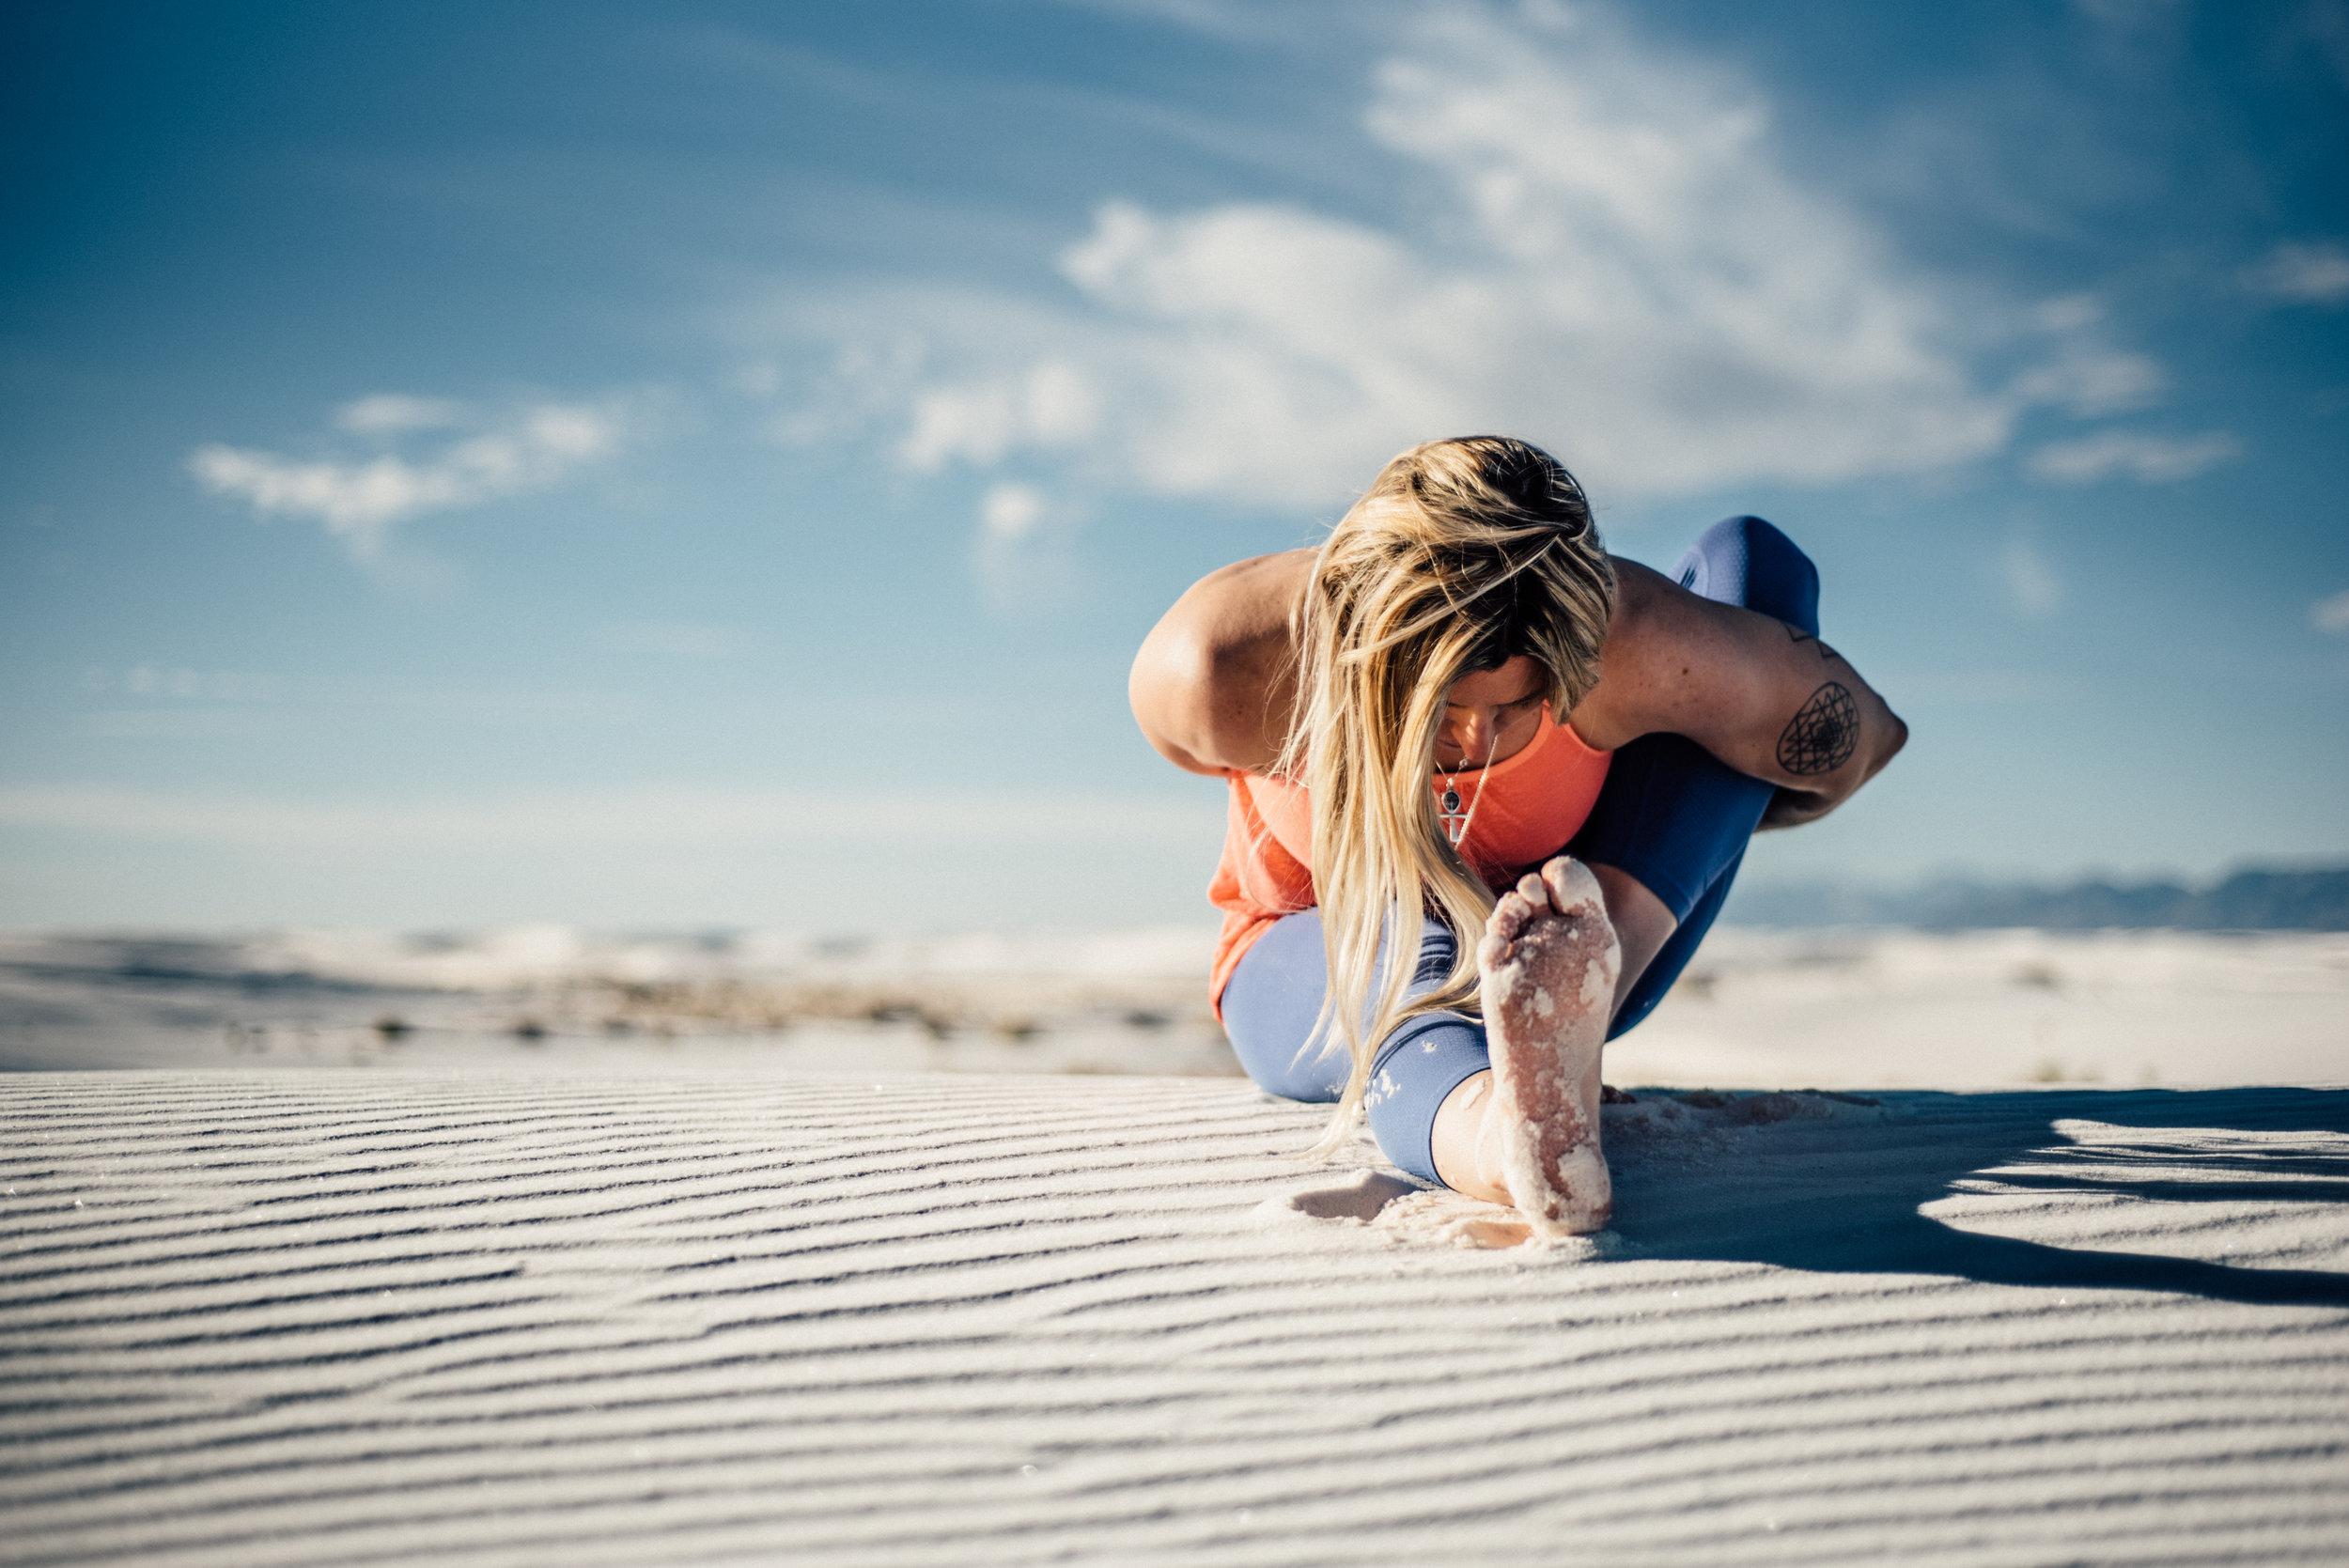 Lifestyle Yoga Photographer.jpg